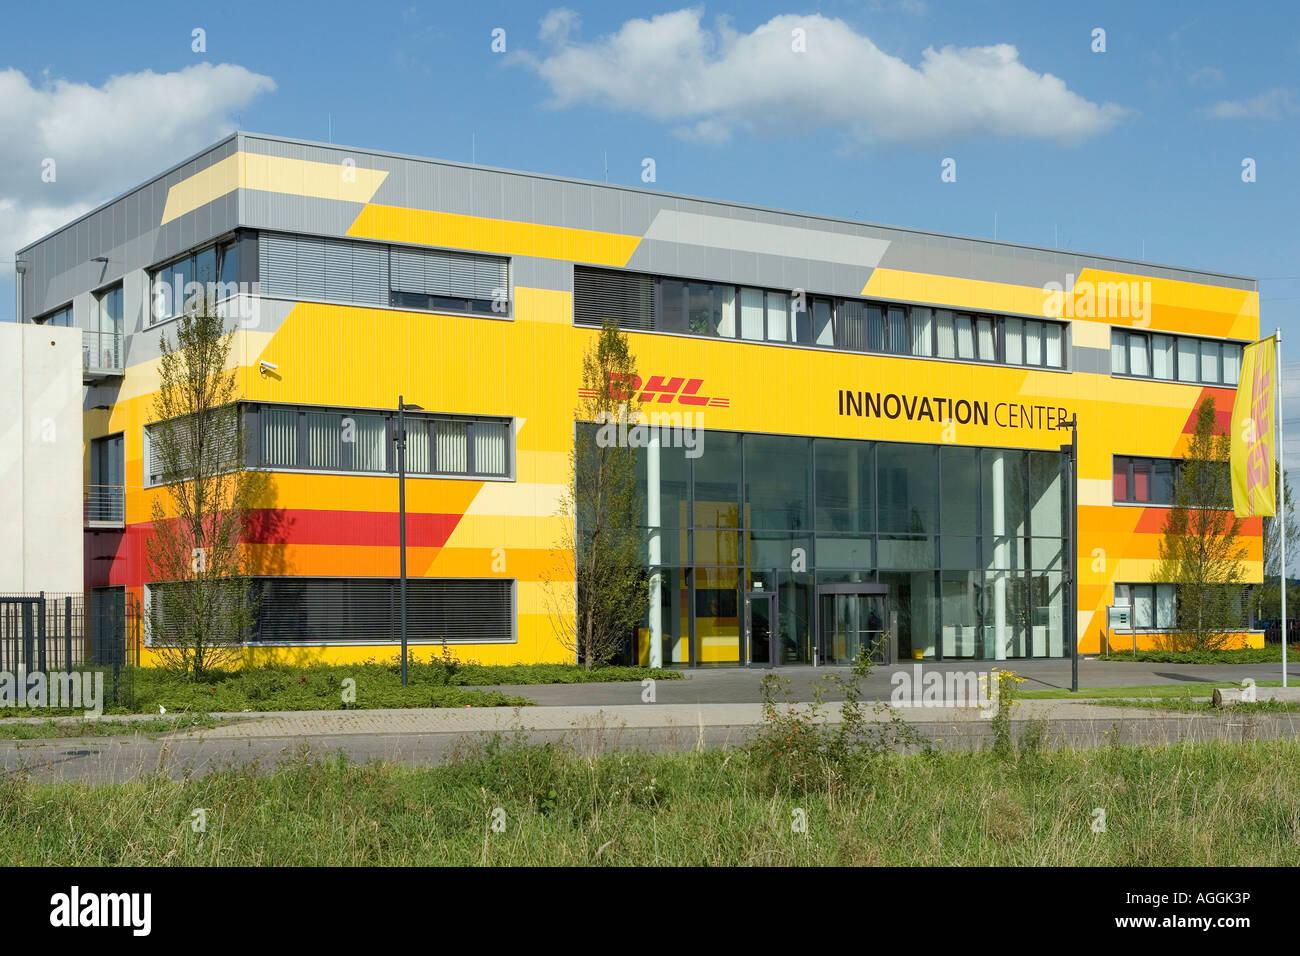 the dhl innovation center of the deutsche post world net in troisdorf stock photo 14206233 alamy. Black Bedroom Furniture Sets. Home Design Ideas